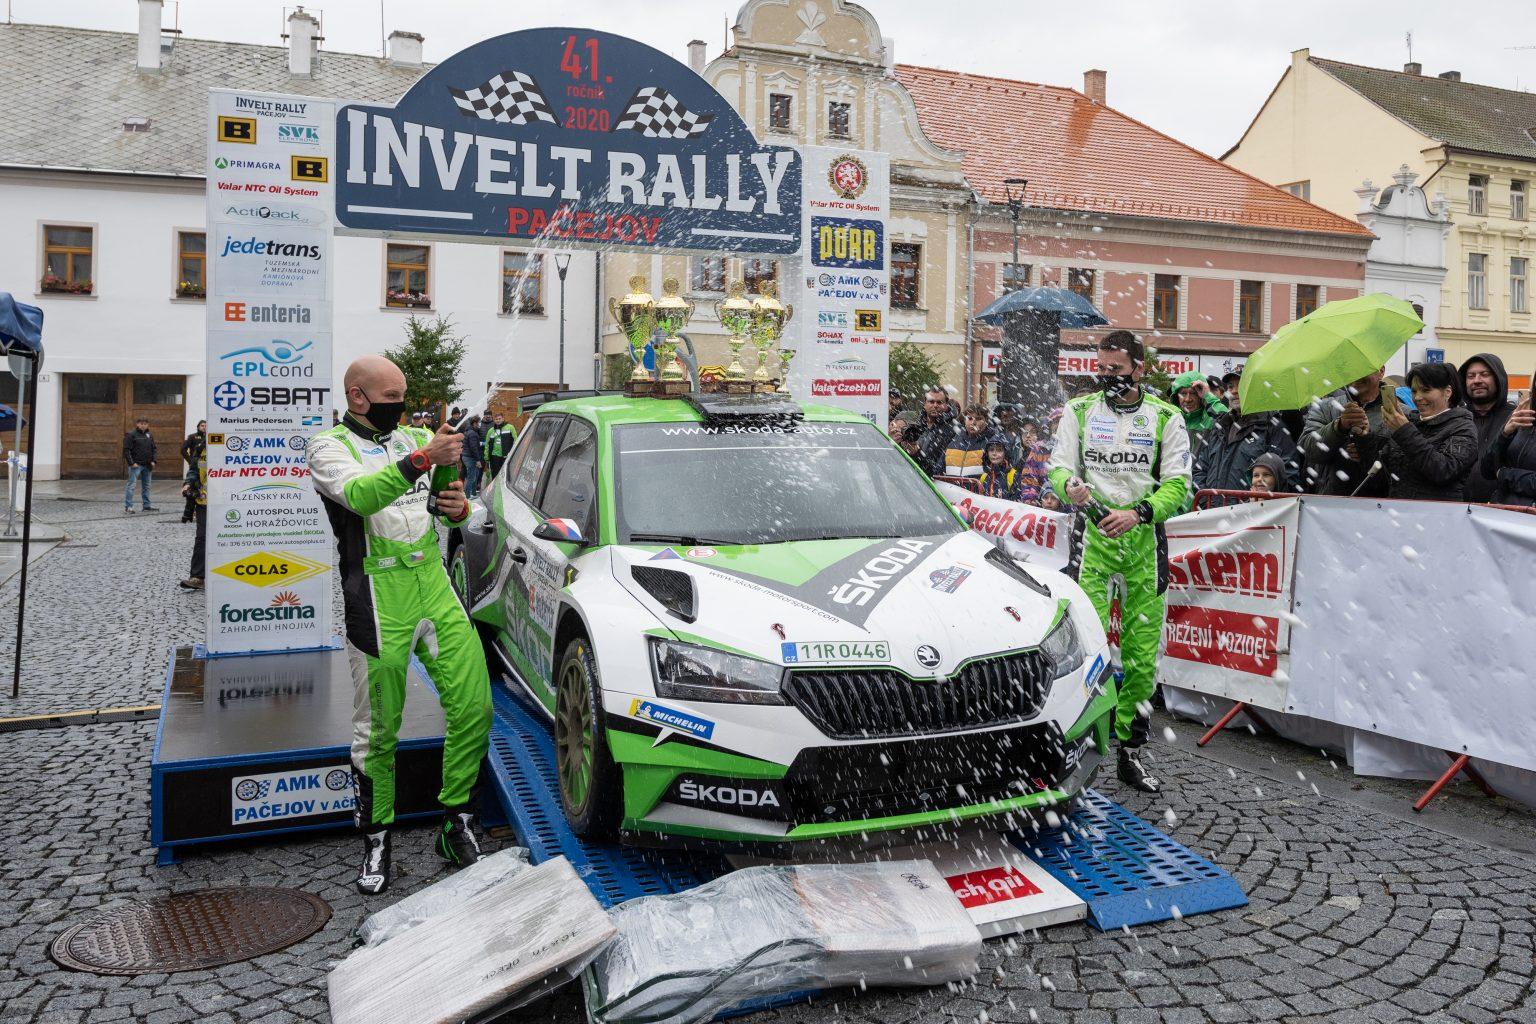 Invelt-Rally-Pacejov-2020_cilova-rampa-1536x1024